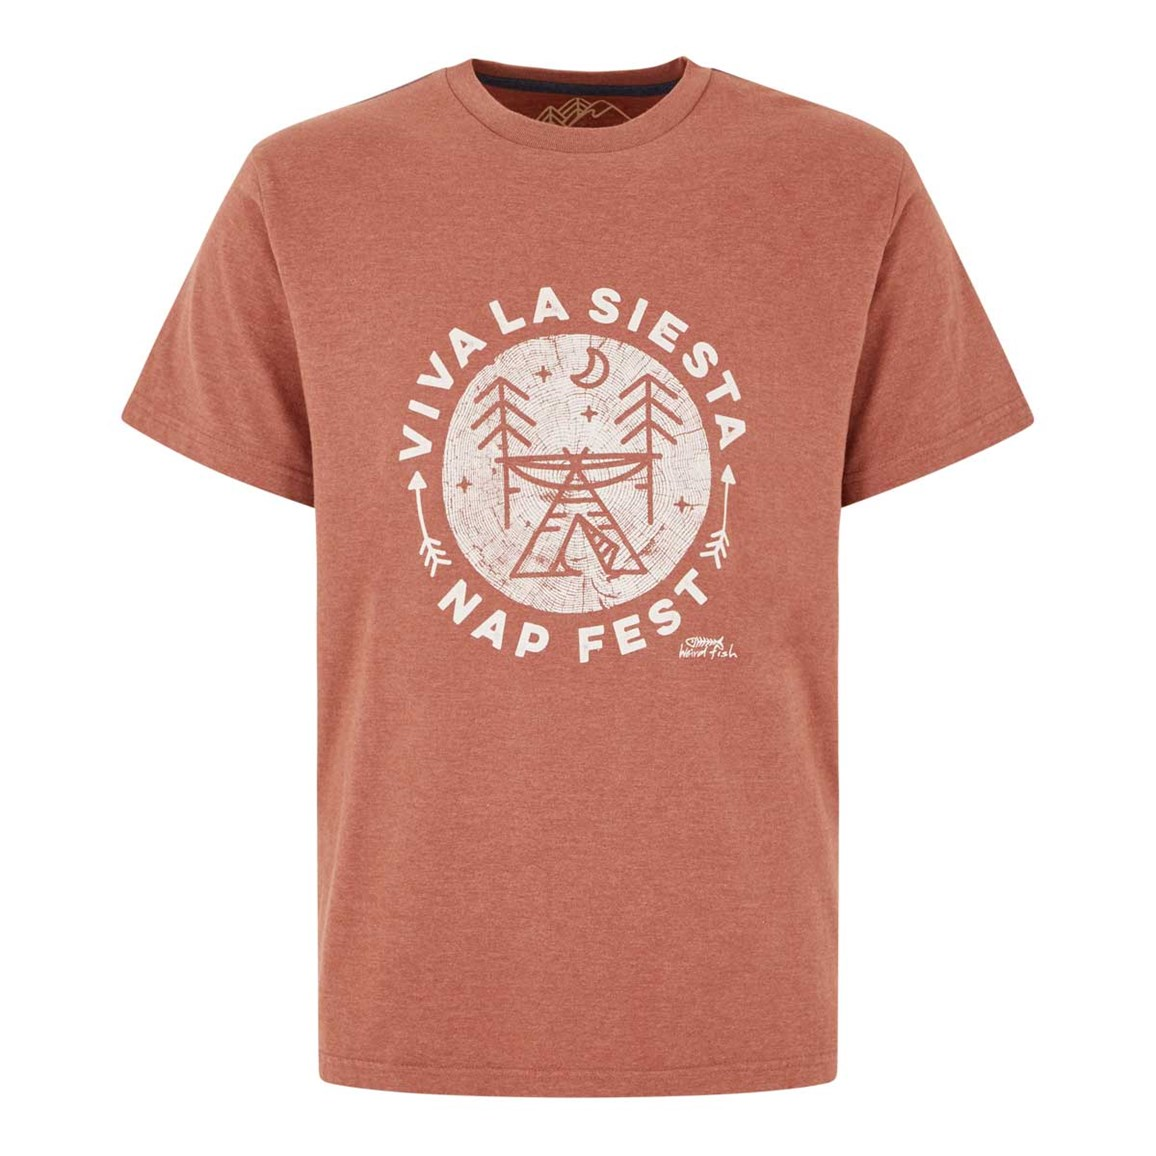 Weird Fish Carlo Graphic Print T-Shirt Brick Red Marl Size 2XL